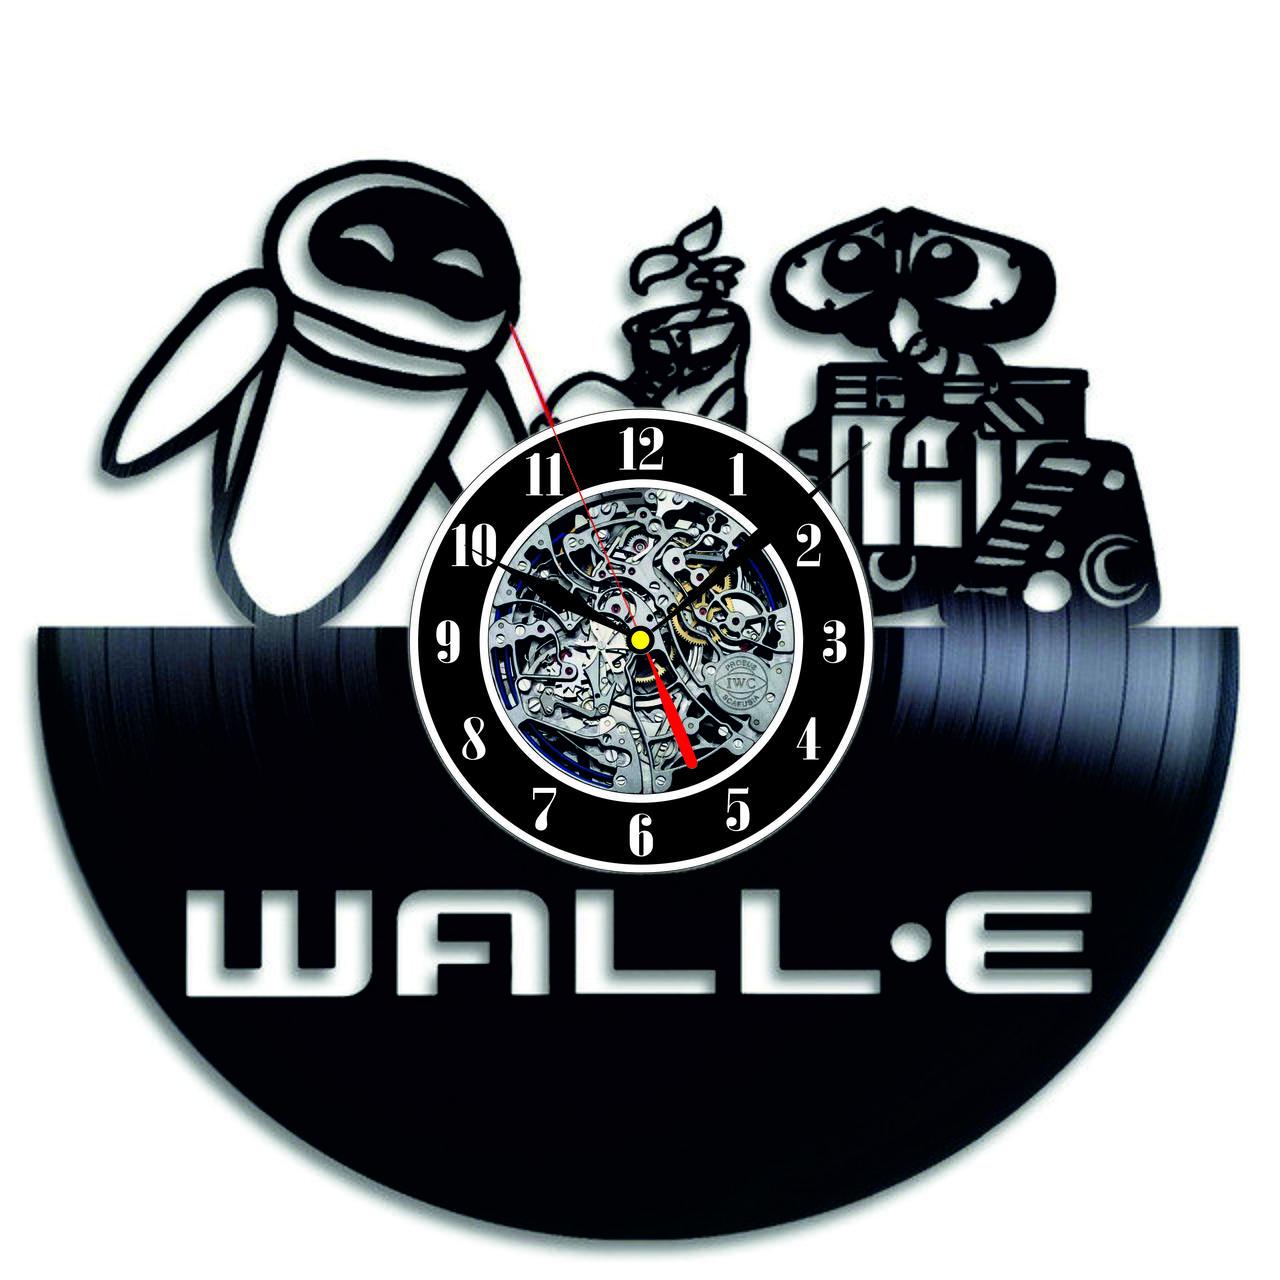 Настенные часы из виниловых пластинок LikeMark WALL-E